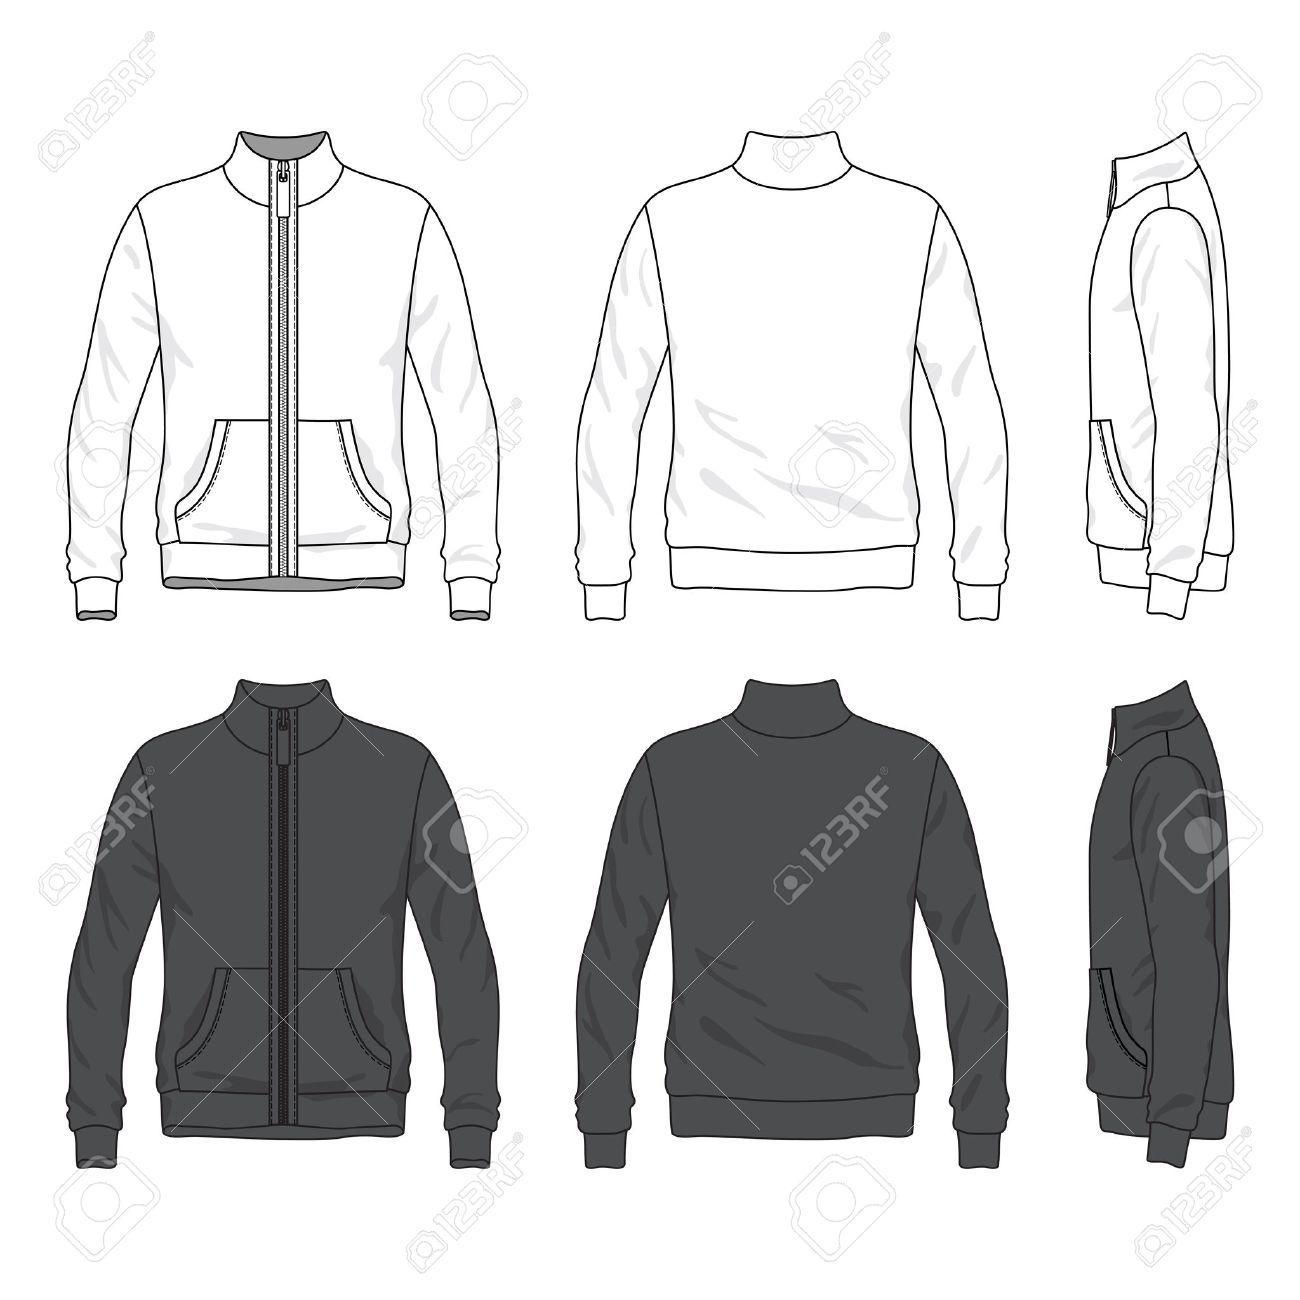 Blank Men s Jacket With Zipper